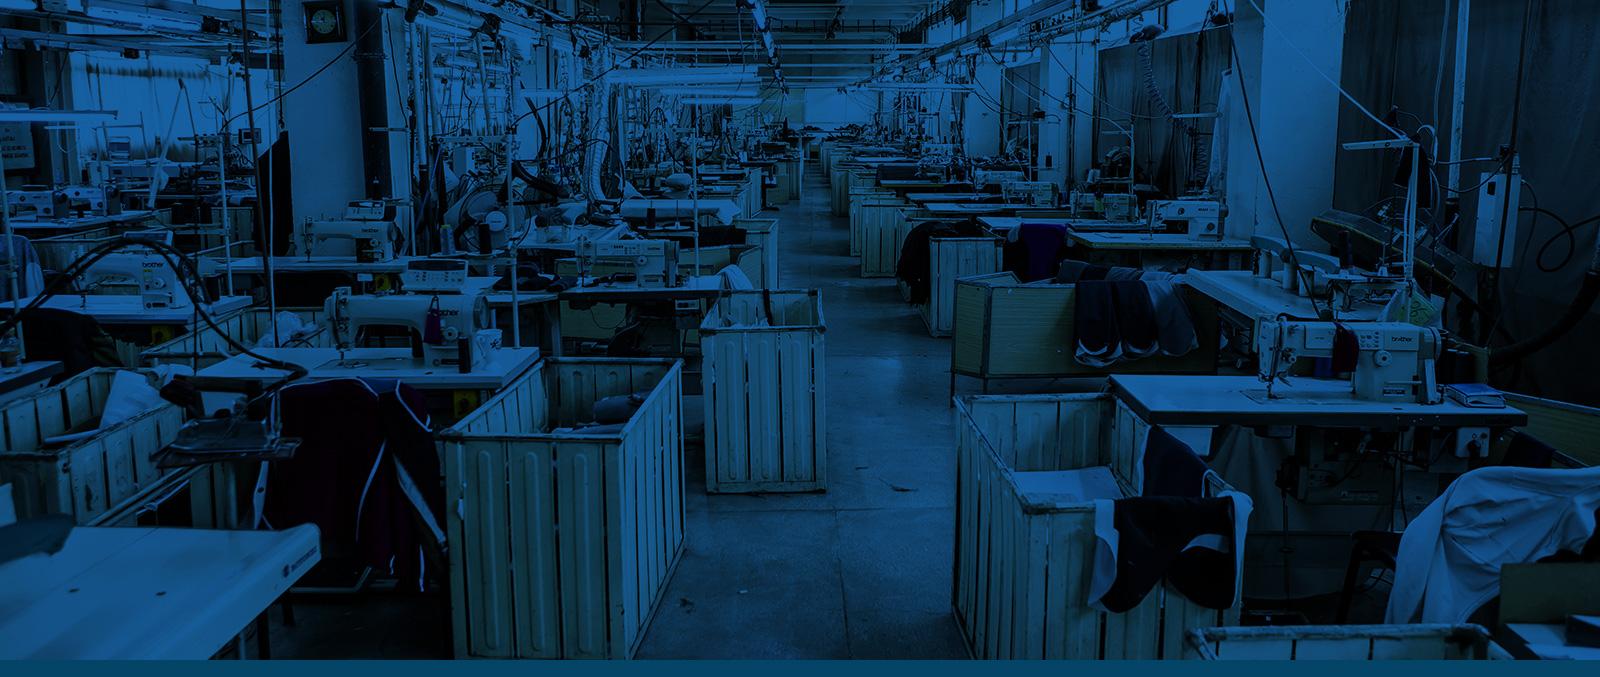 GarmentFactory